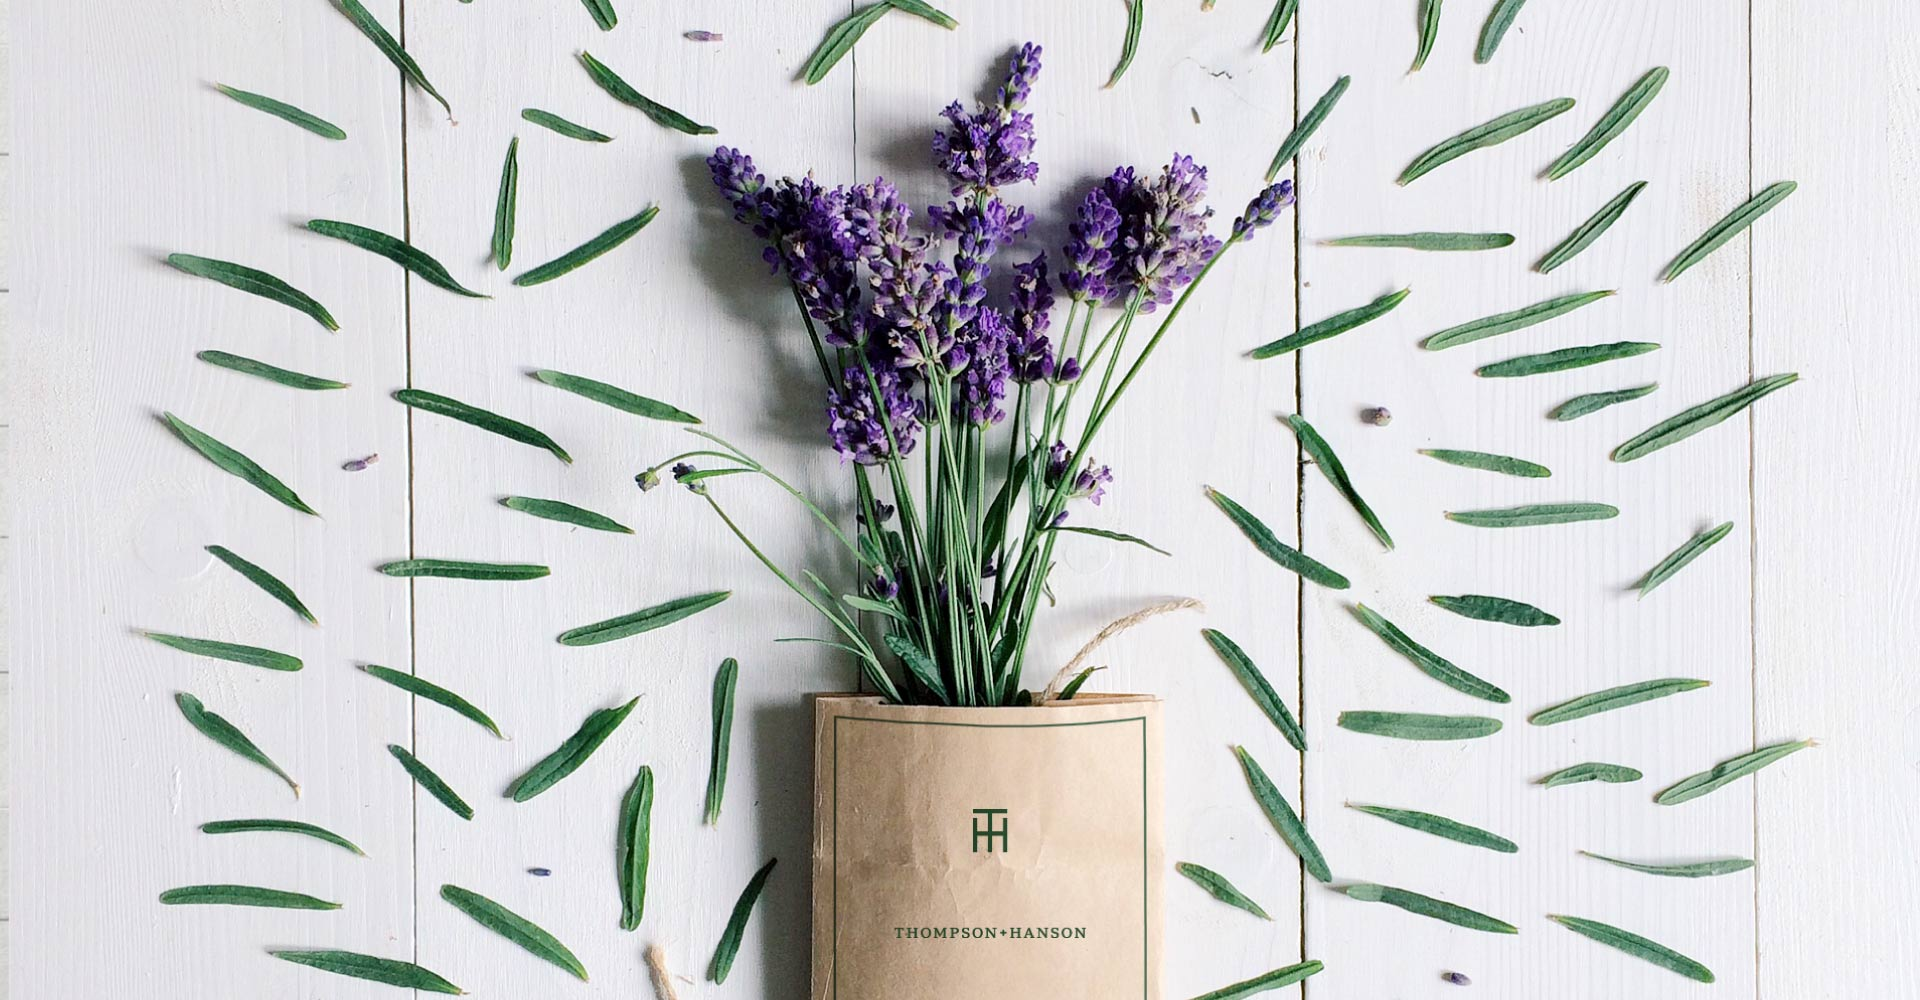 Creative_Retail_Packaging_Thompson_Hanson_Branding_17.jpg